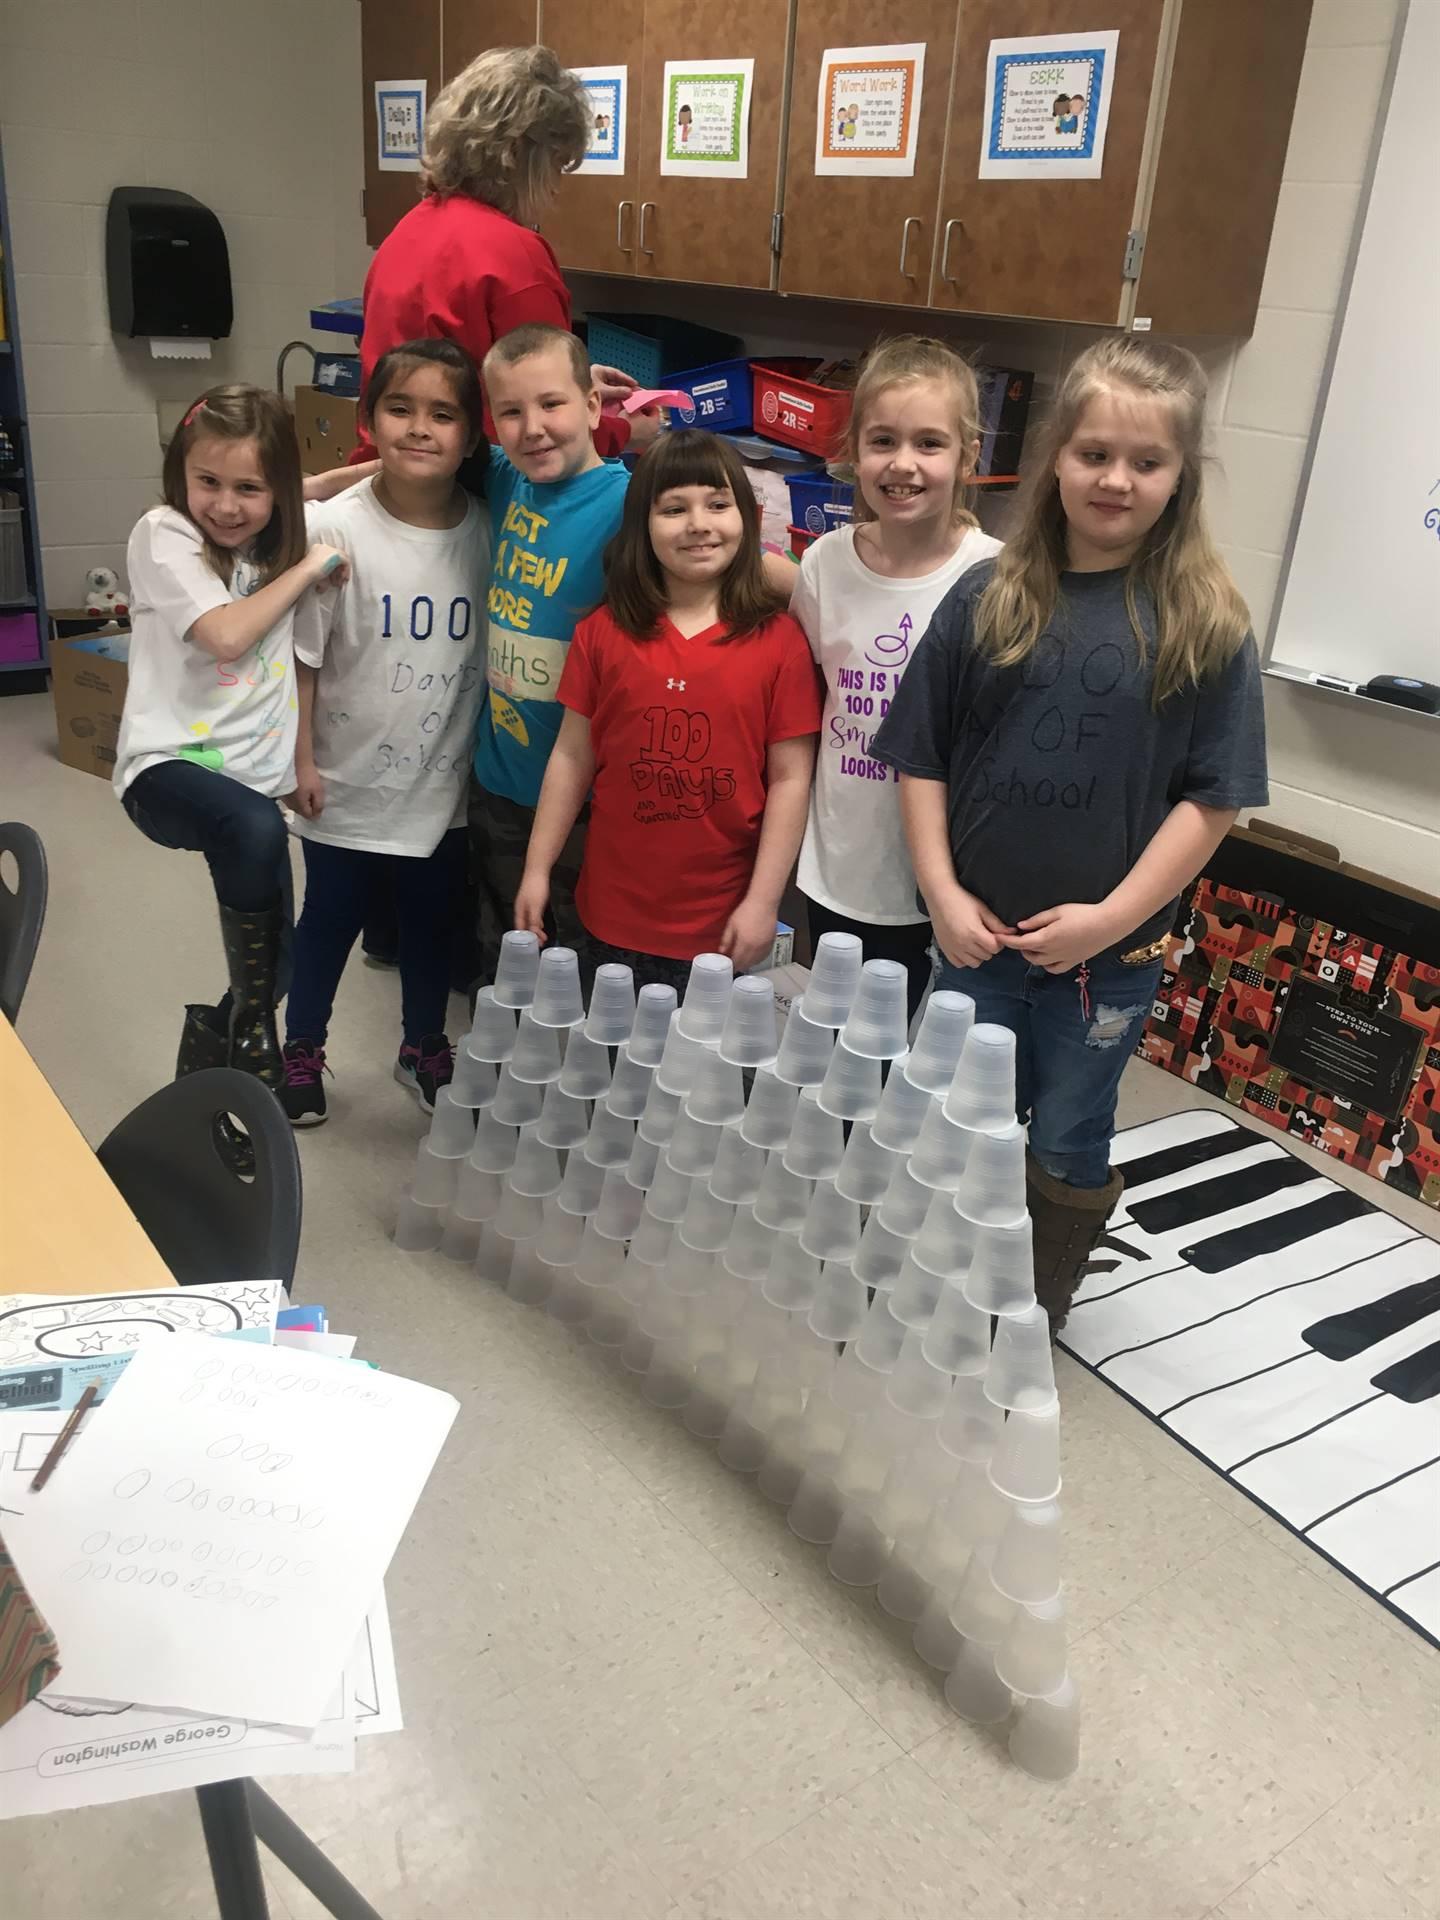 Second grade celebrates 100 days